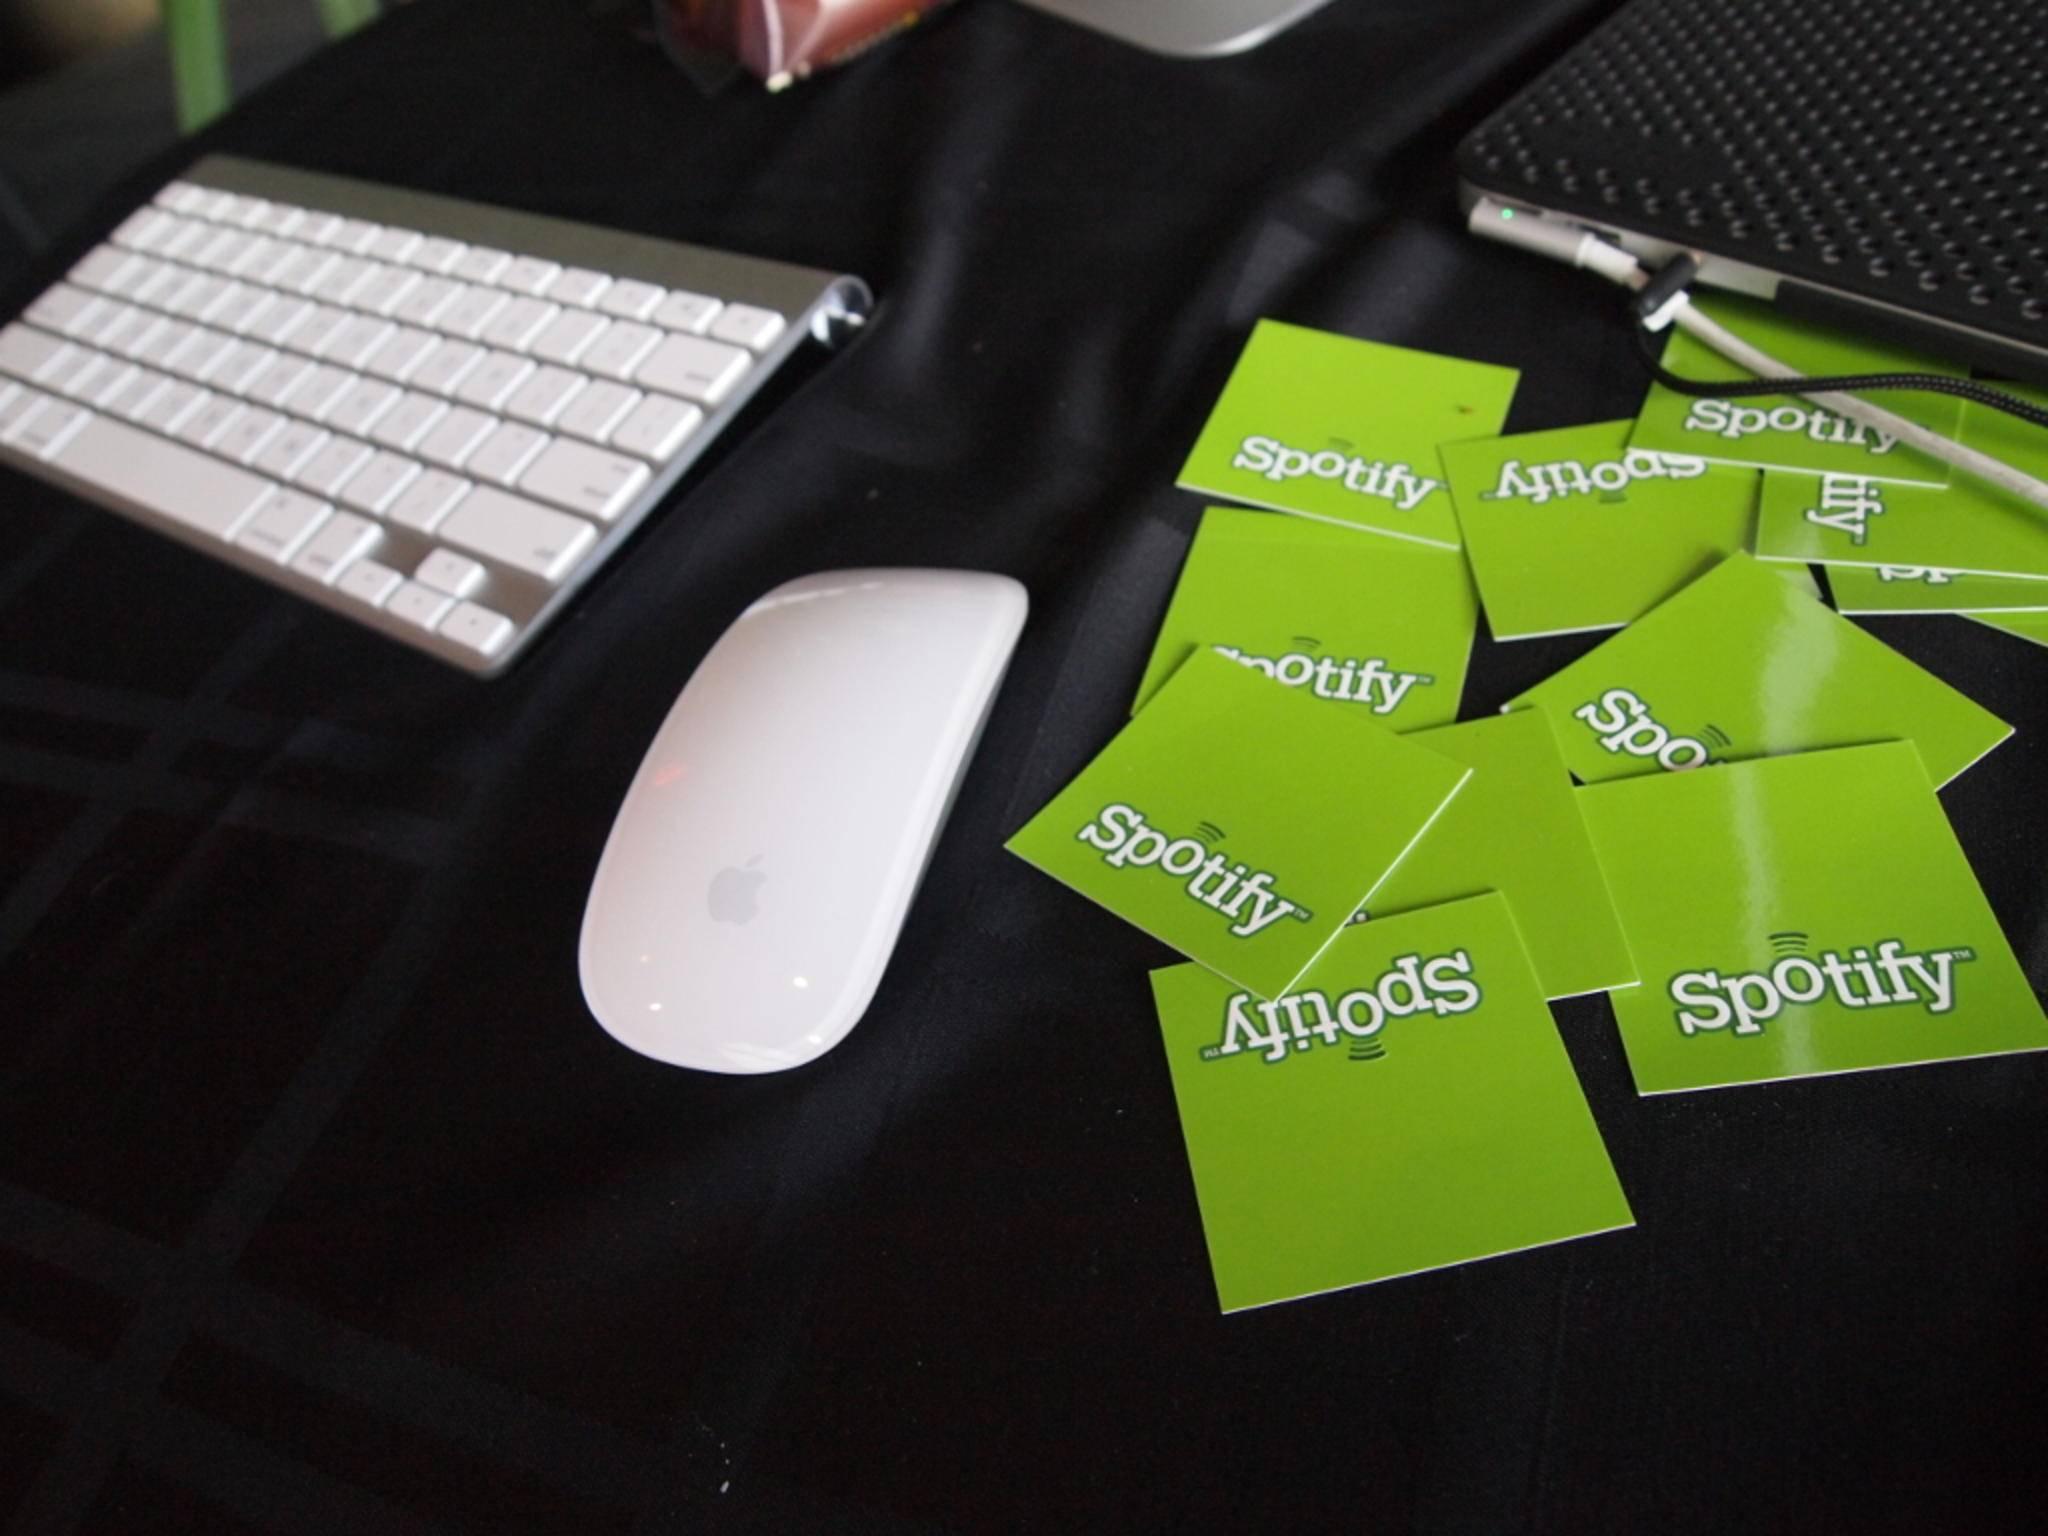 Spotify integriert die Musixmatch-App in seinen Desktop-Player.